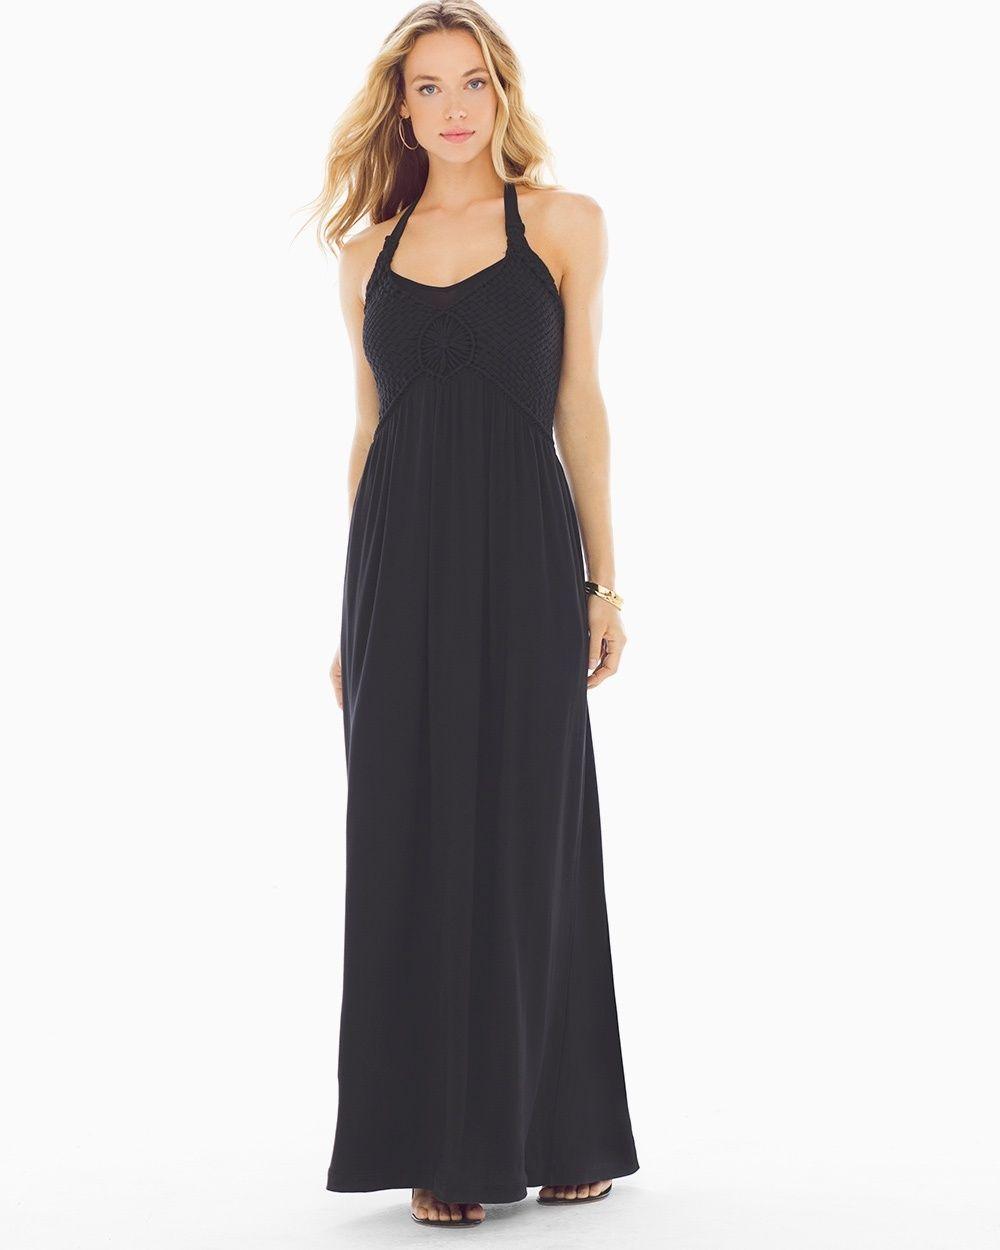 Soma Basketweave Maxi Dress Black, Size: